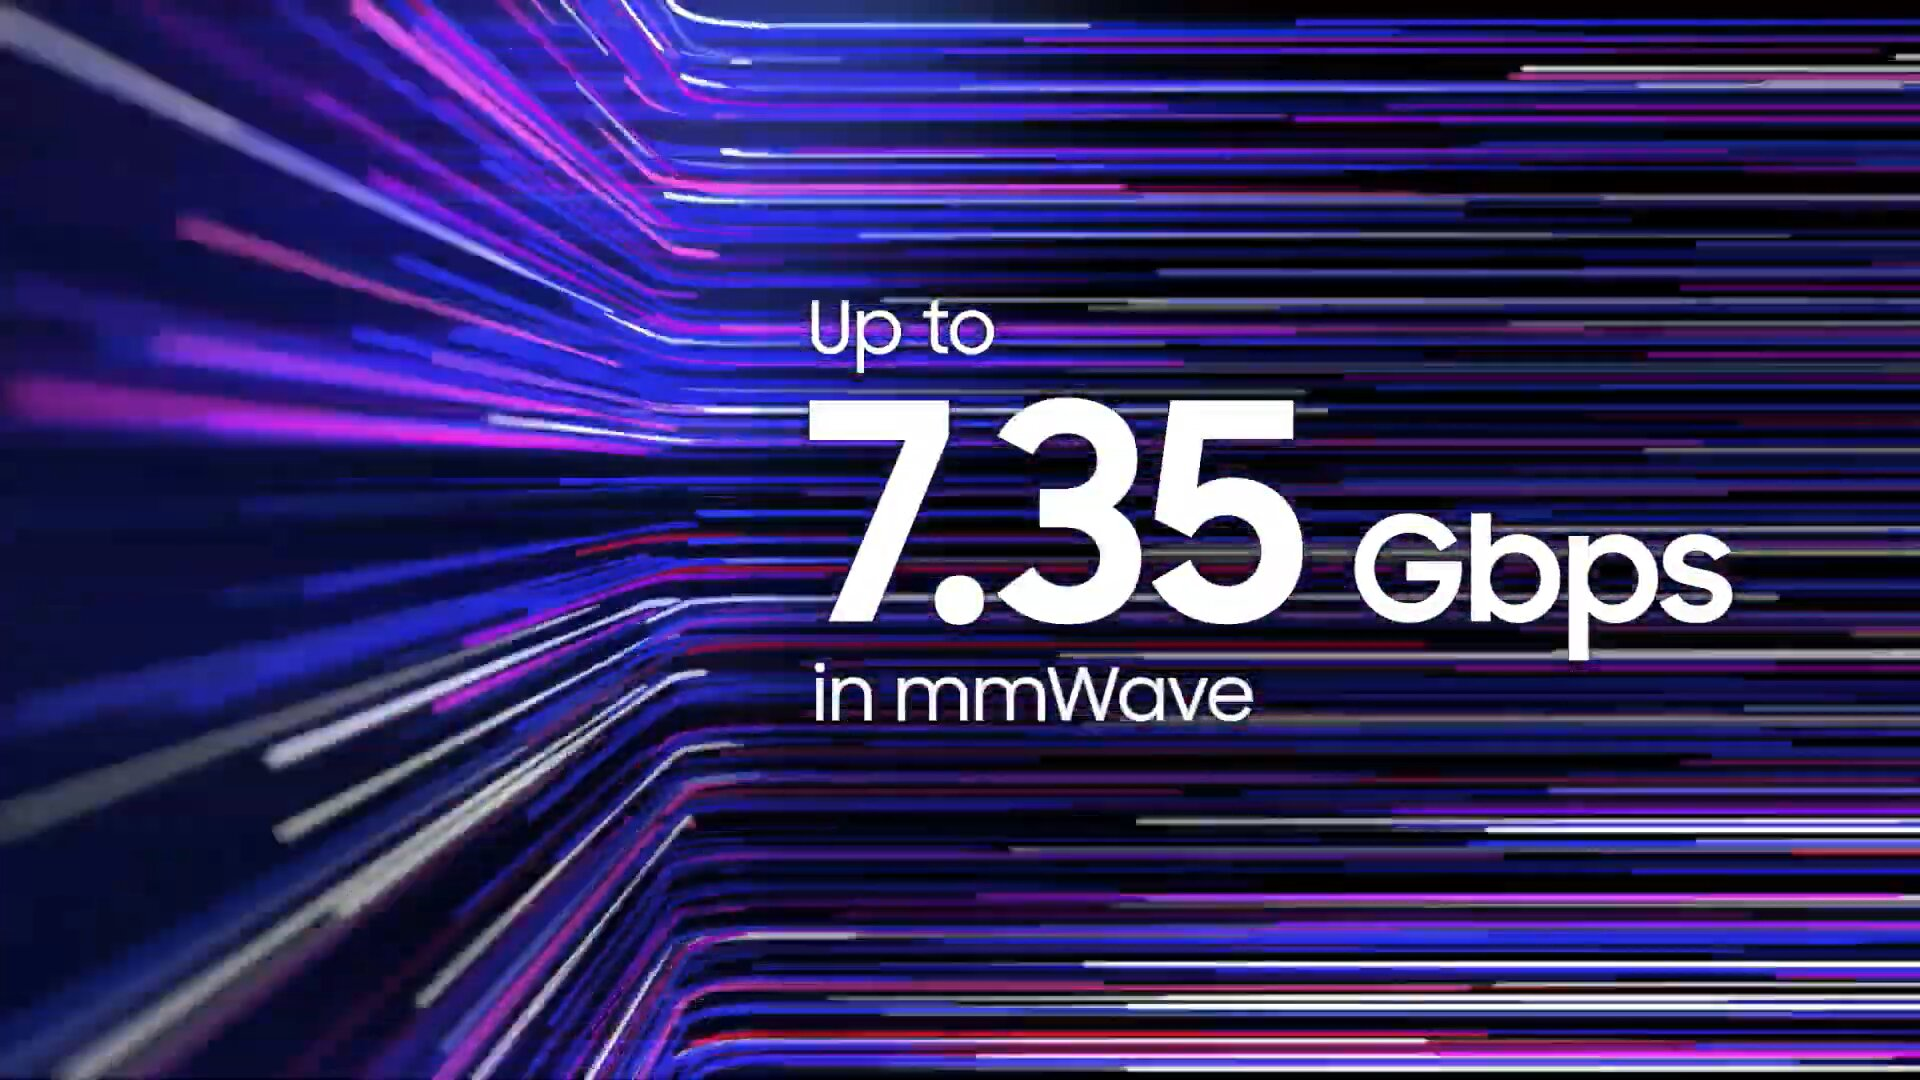 7,35Gbit/s im Downlink über mmWave